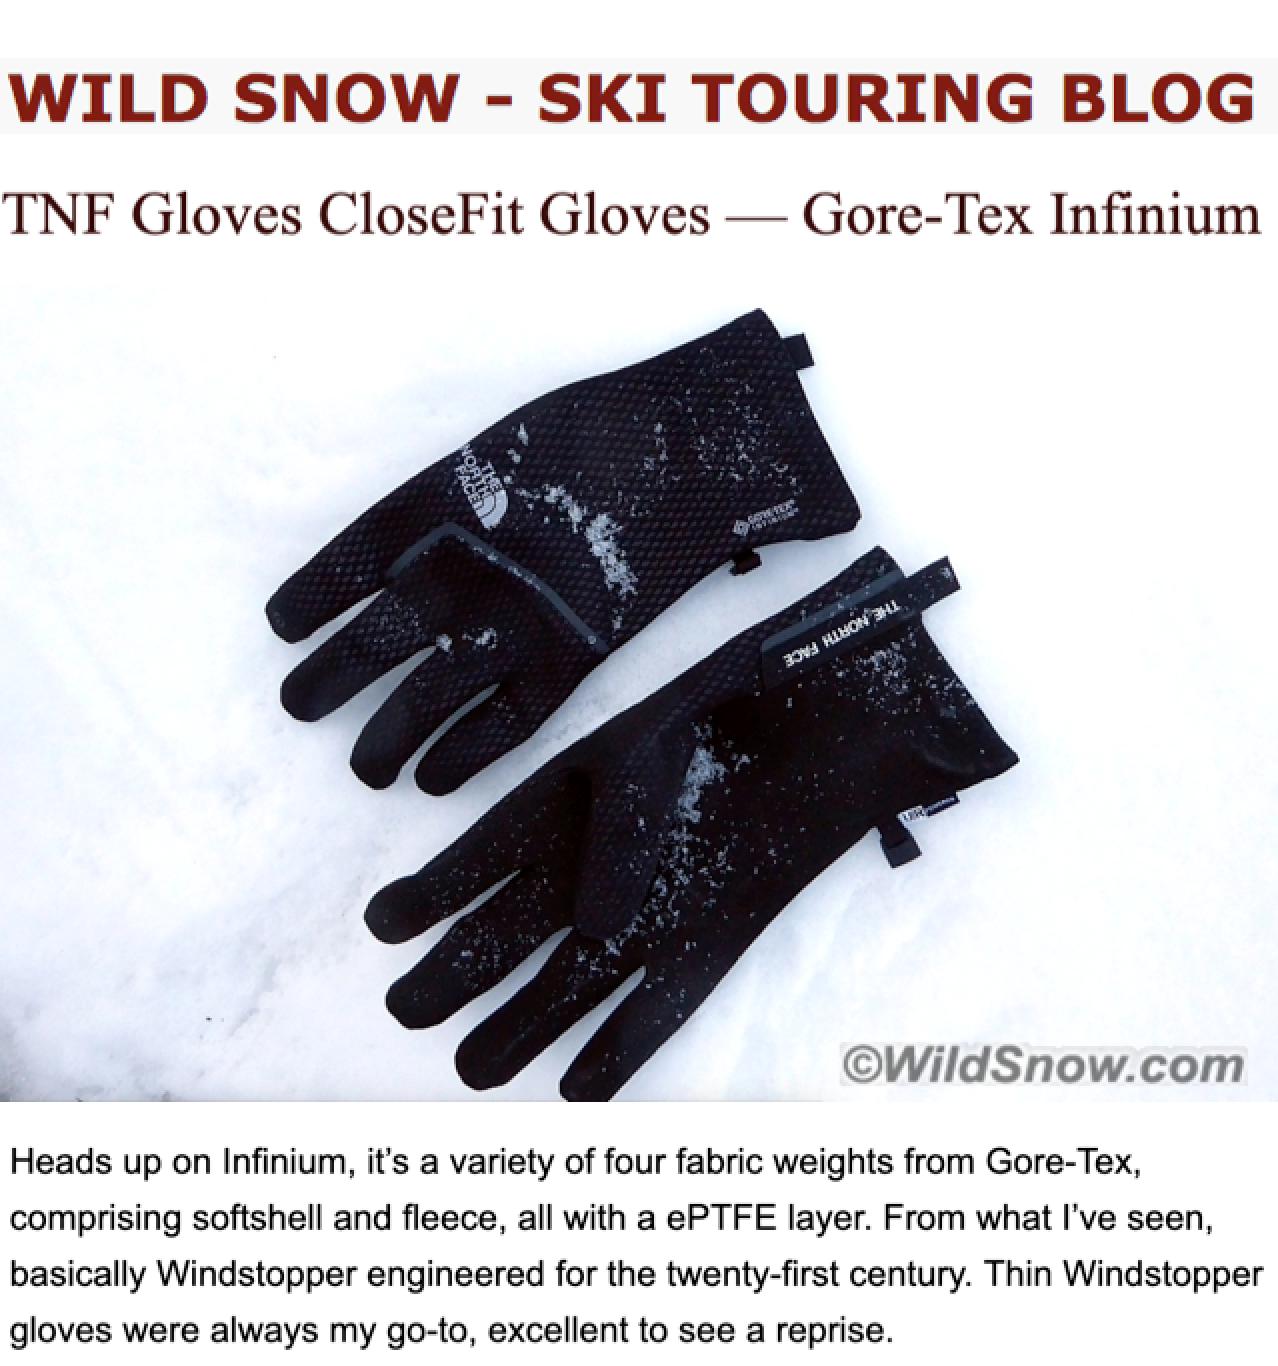 b647f5b83 Wild Snow reviews TNF CloseFit glove with INFINIUM Technology | GORE ...